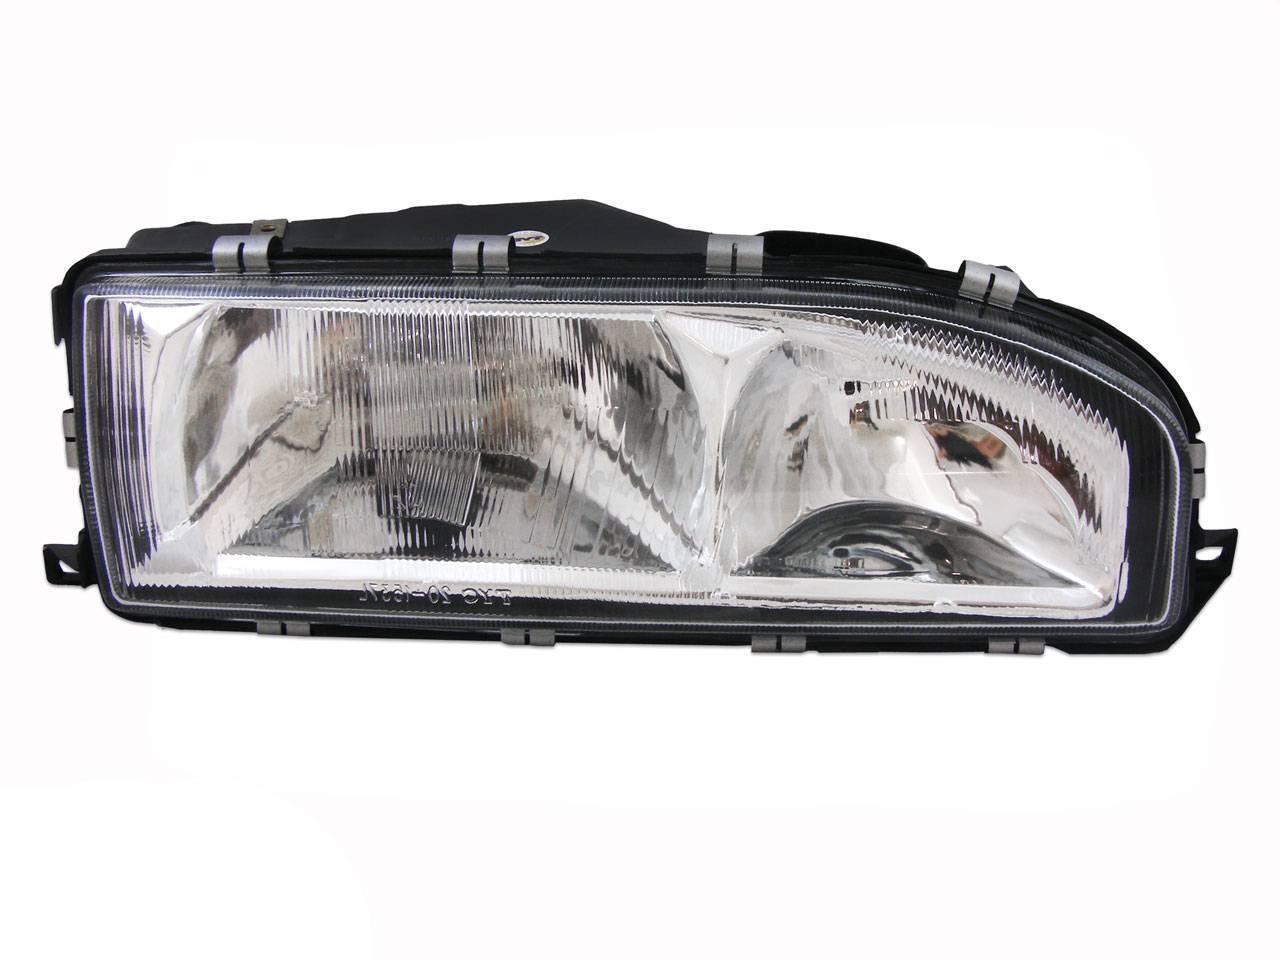 hight resolution of holden vl commodore rhs headlight lamp 86 87 88 berlina calais adr right light